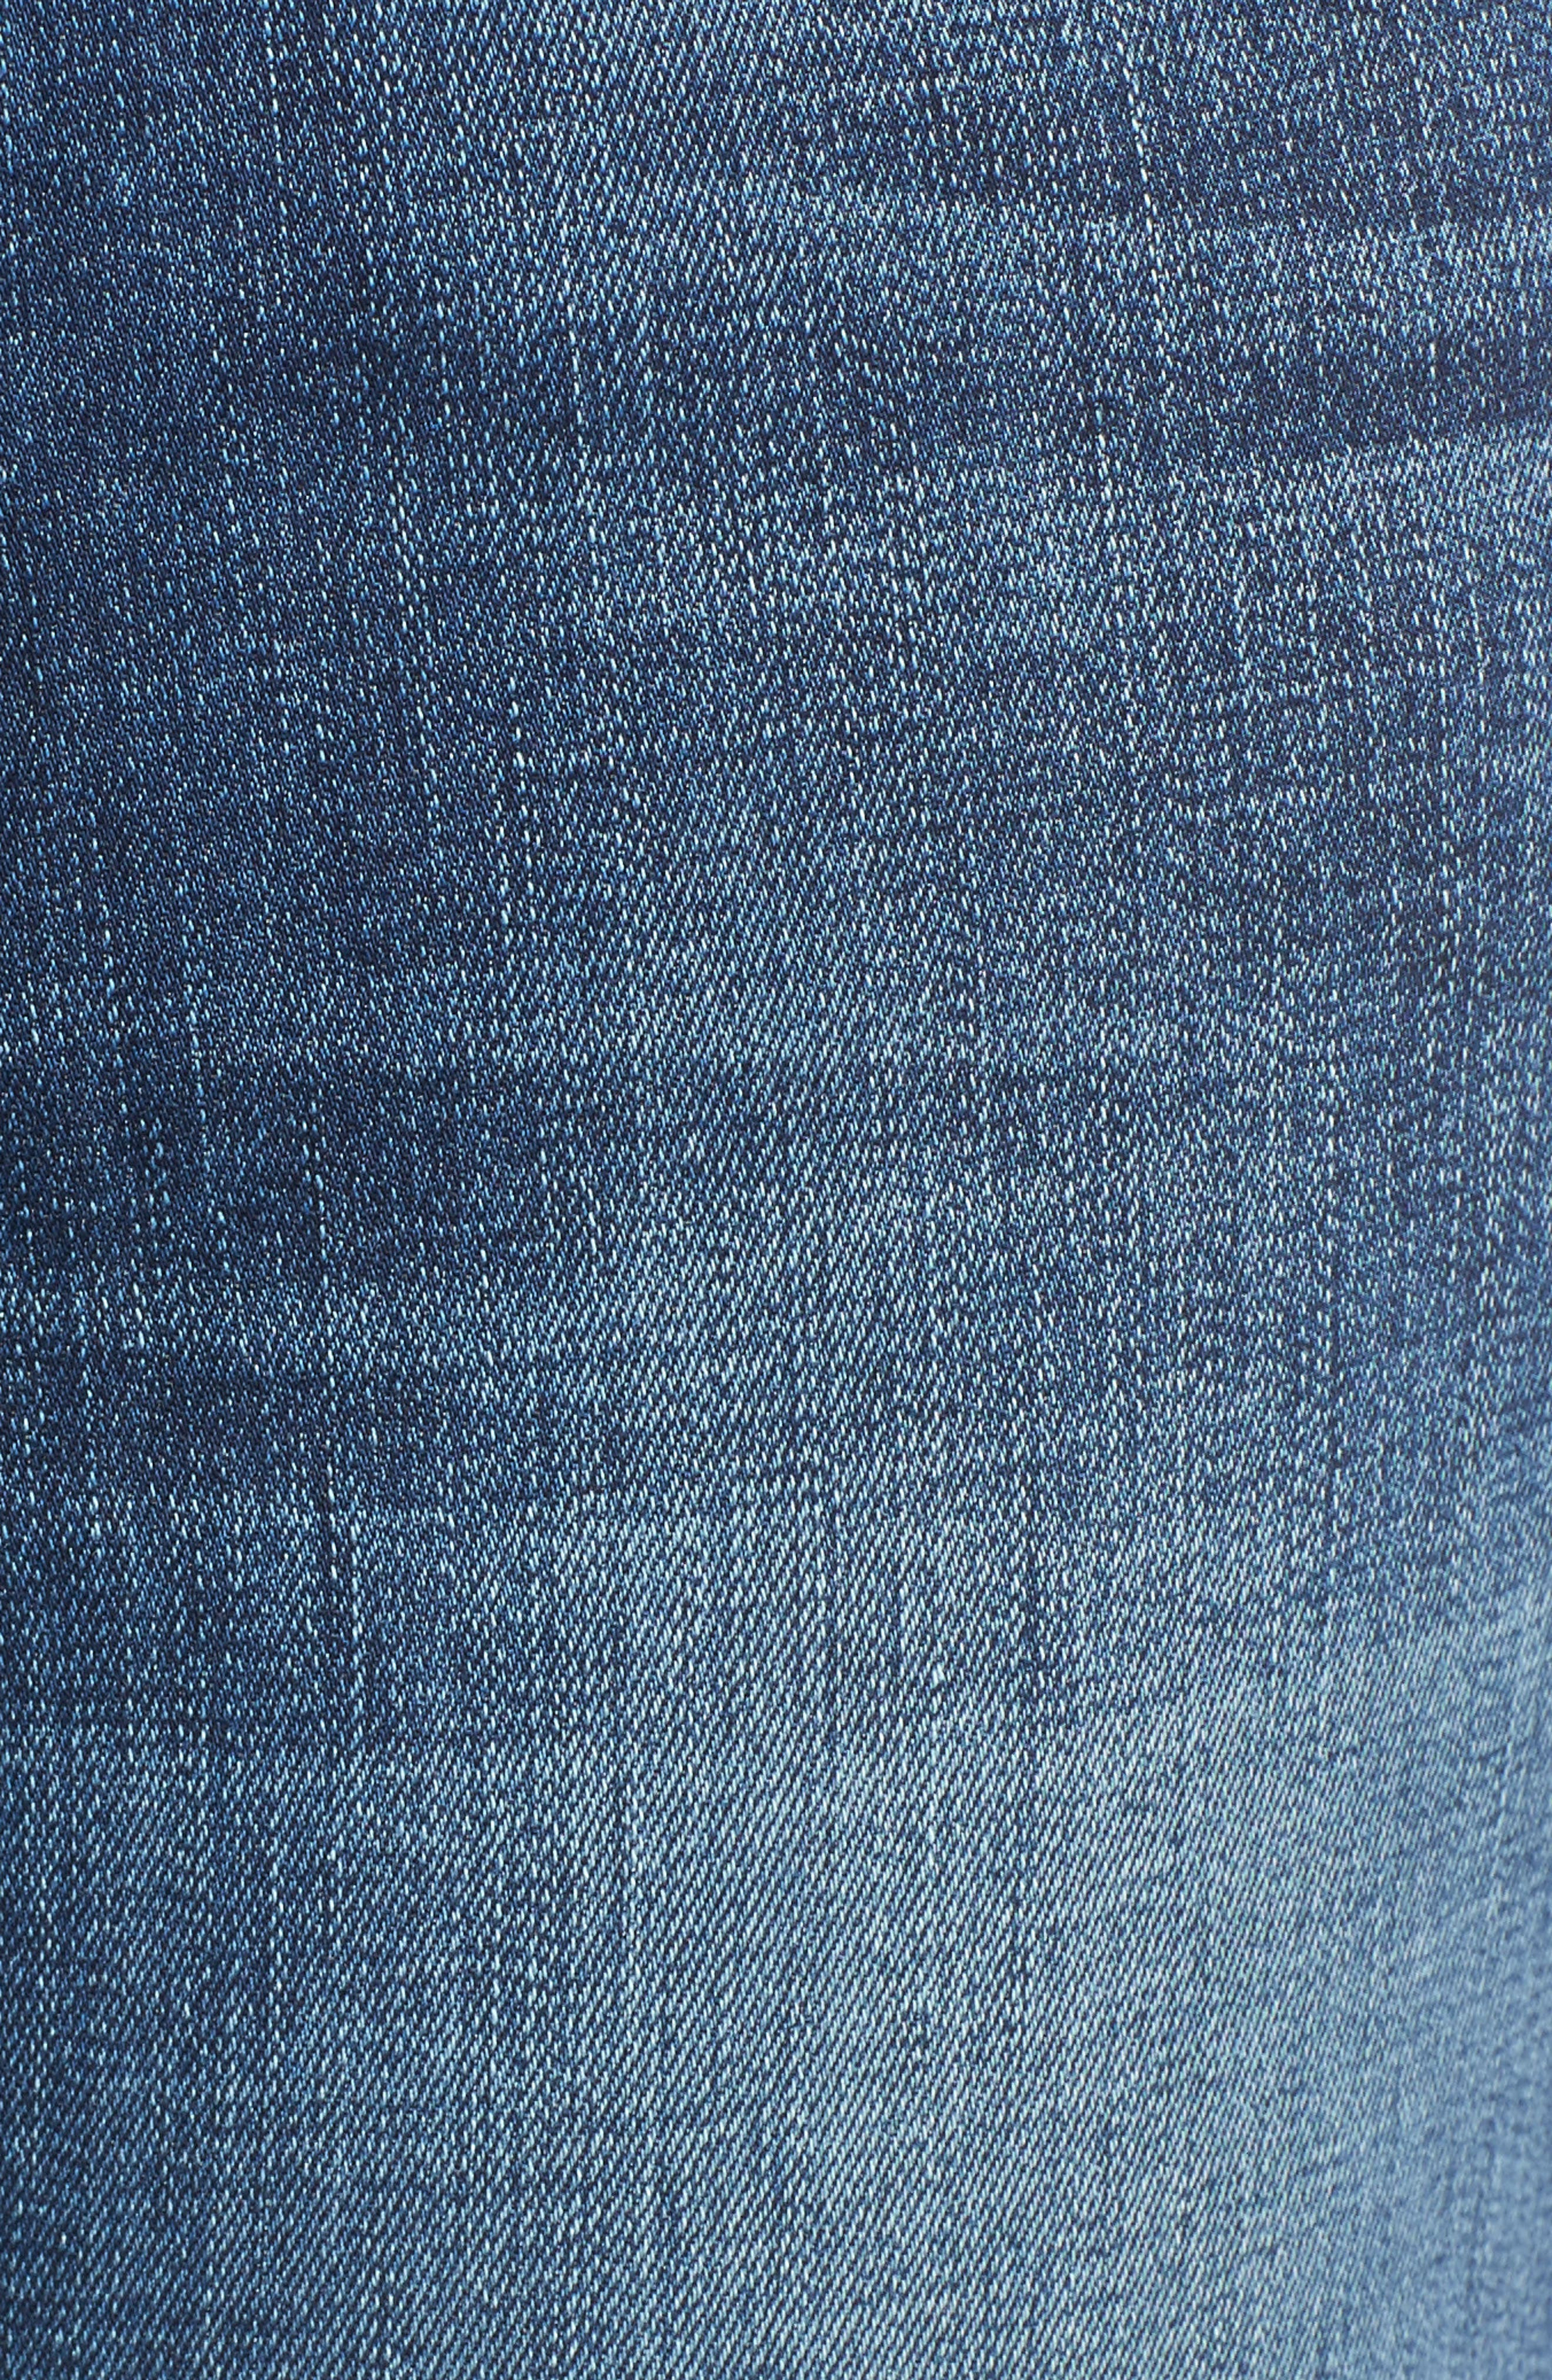 Markie Crop Skinny Jeans,                             Alternate thumbnail 5, color,                             410